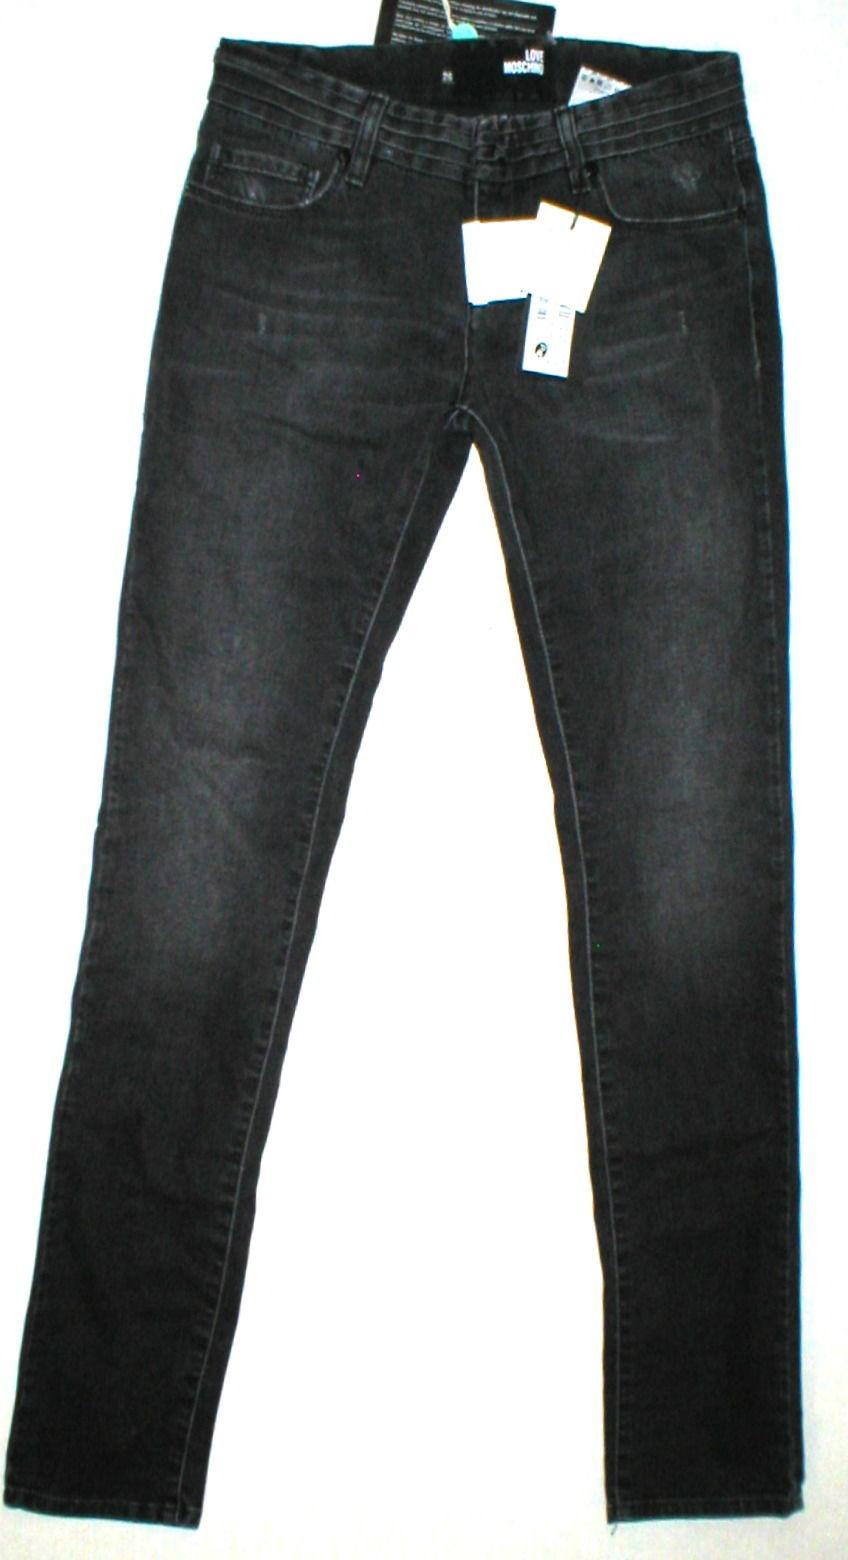 New NWT Womens 26 Designer Love Moschino Black Jeans Distressed Skinny Logo Tall